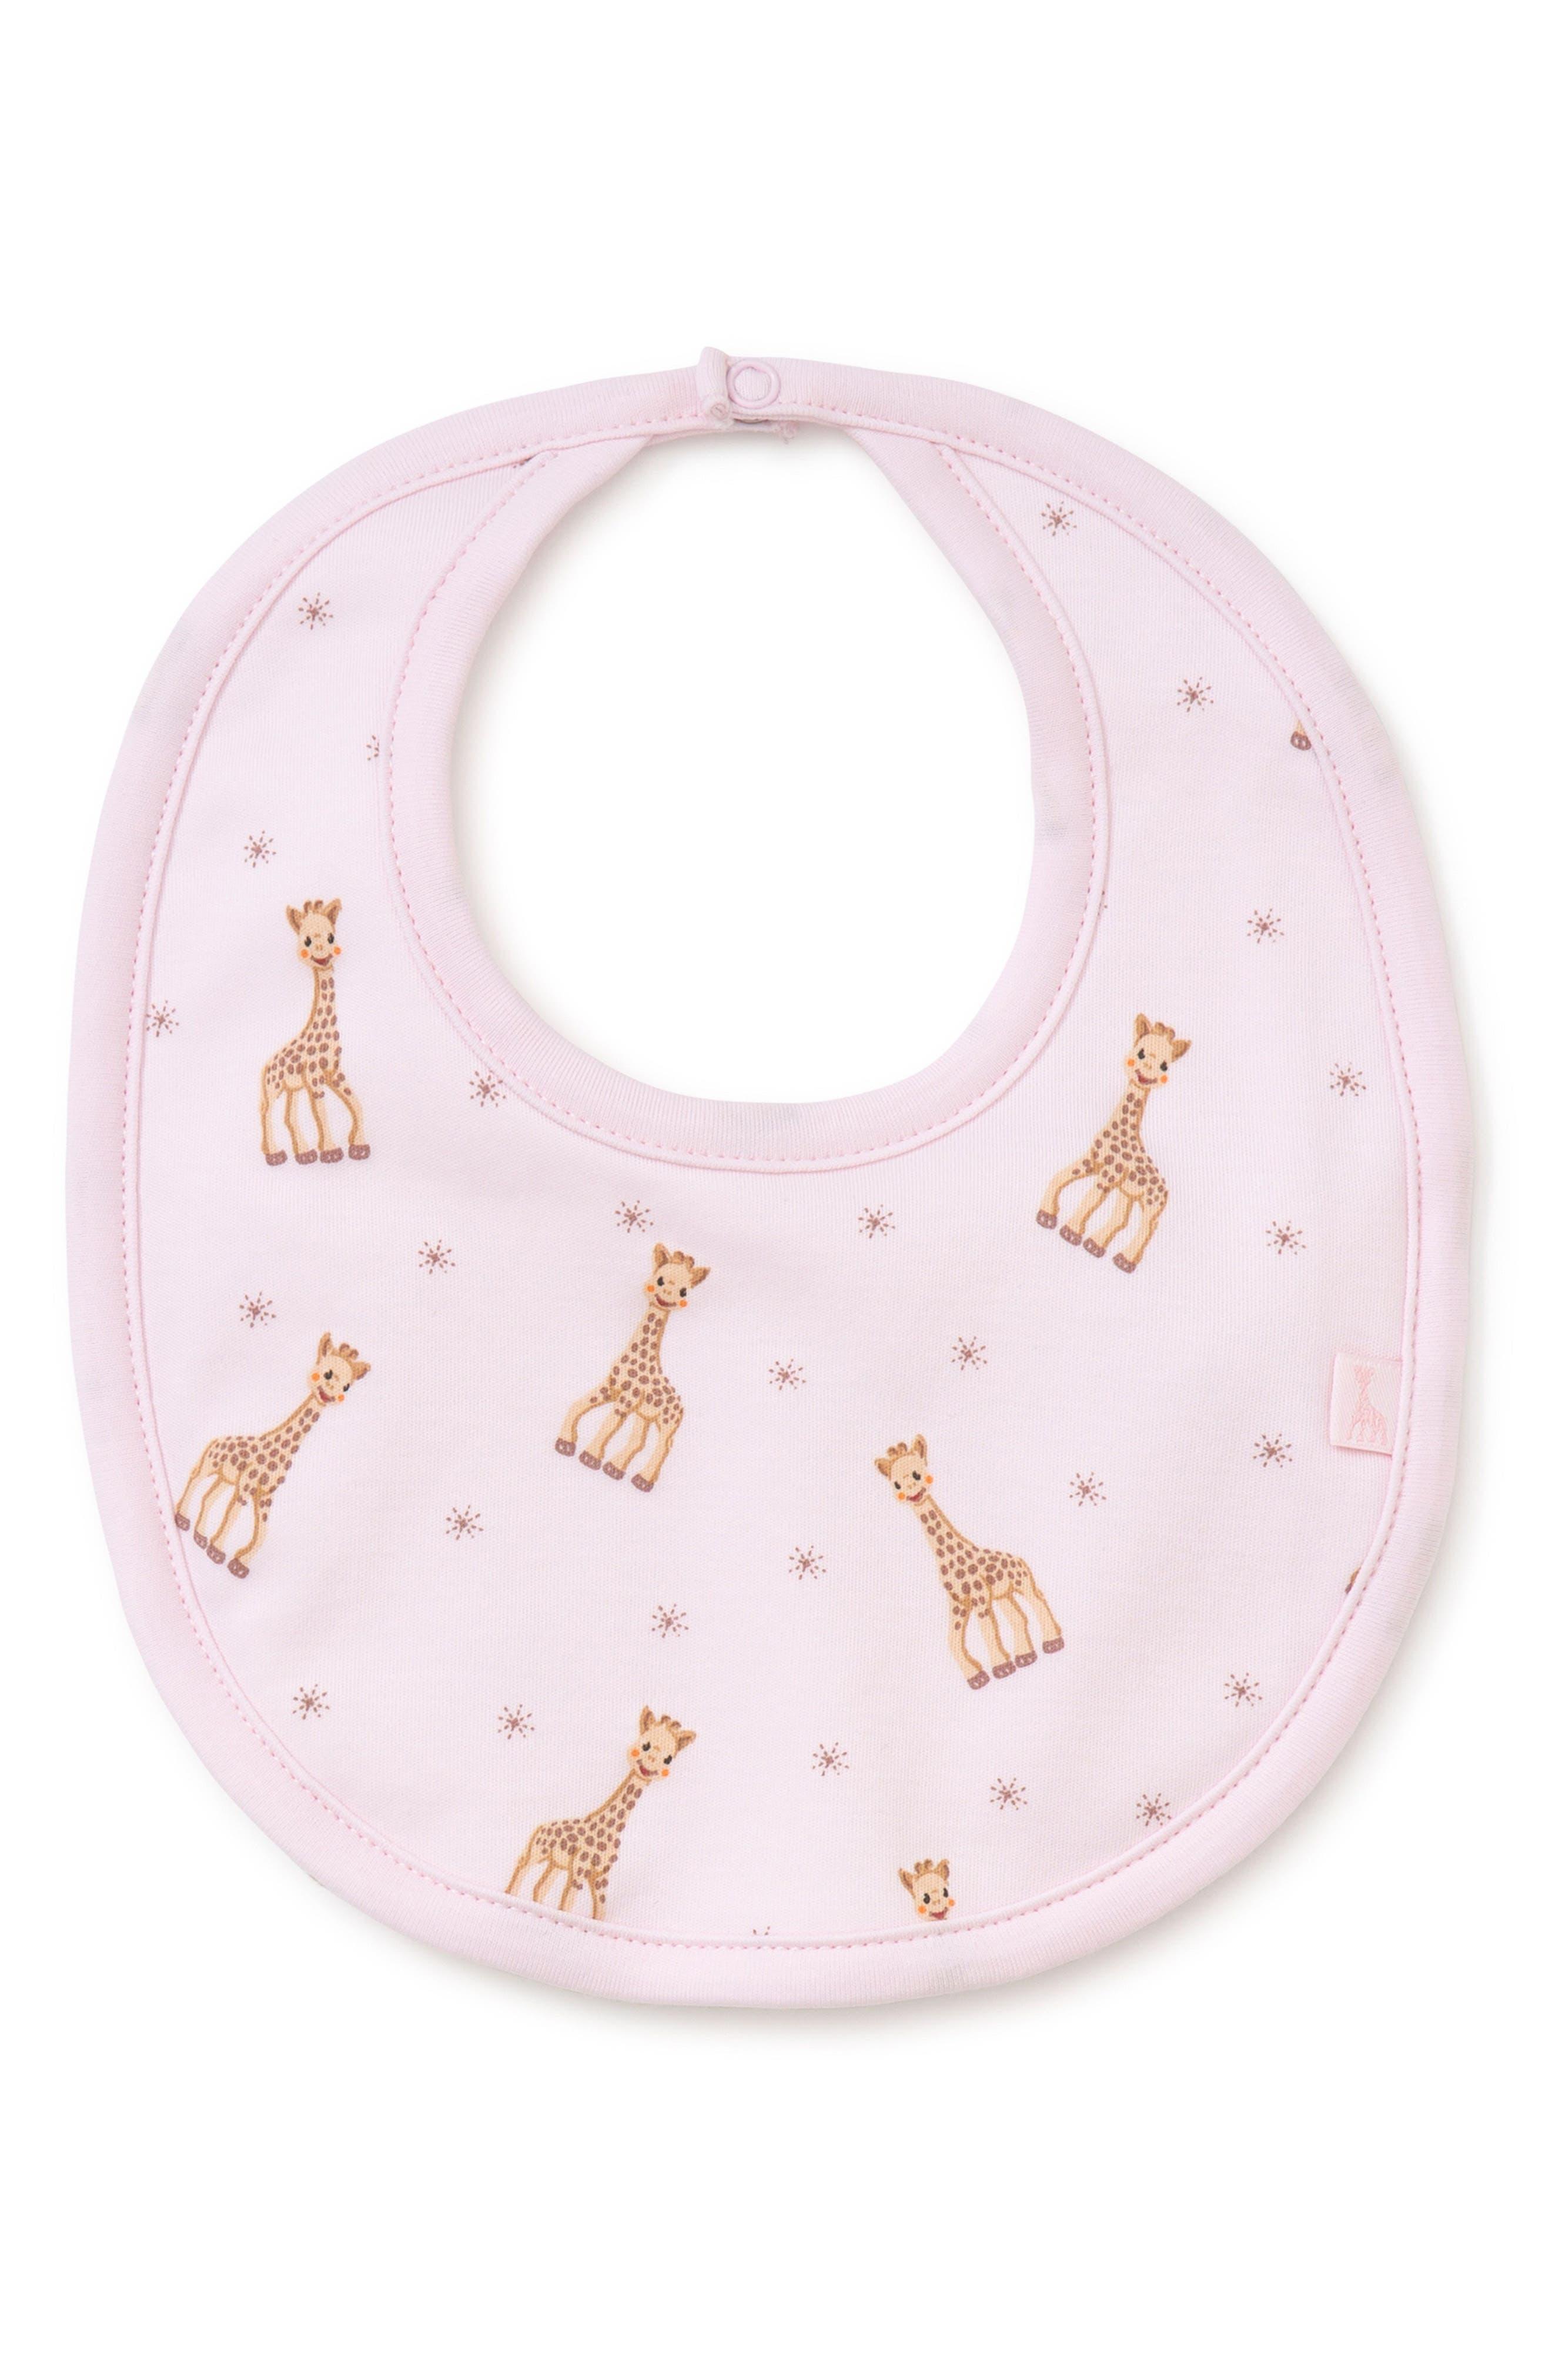 Infant Kissy Kissy X Sophie La Girafe Bib Size One Size  Pink